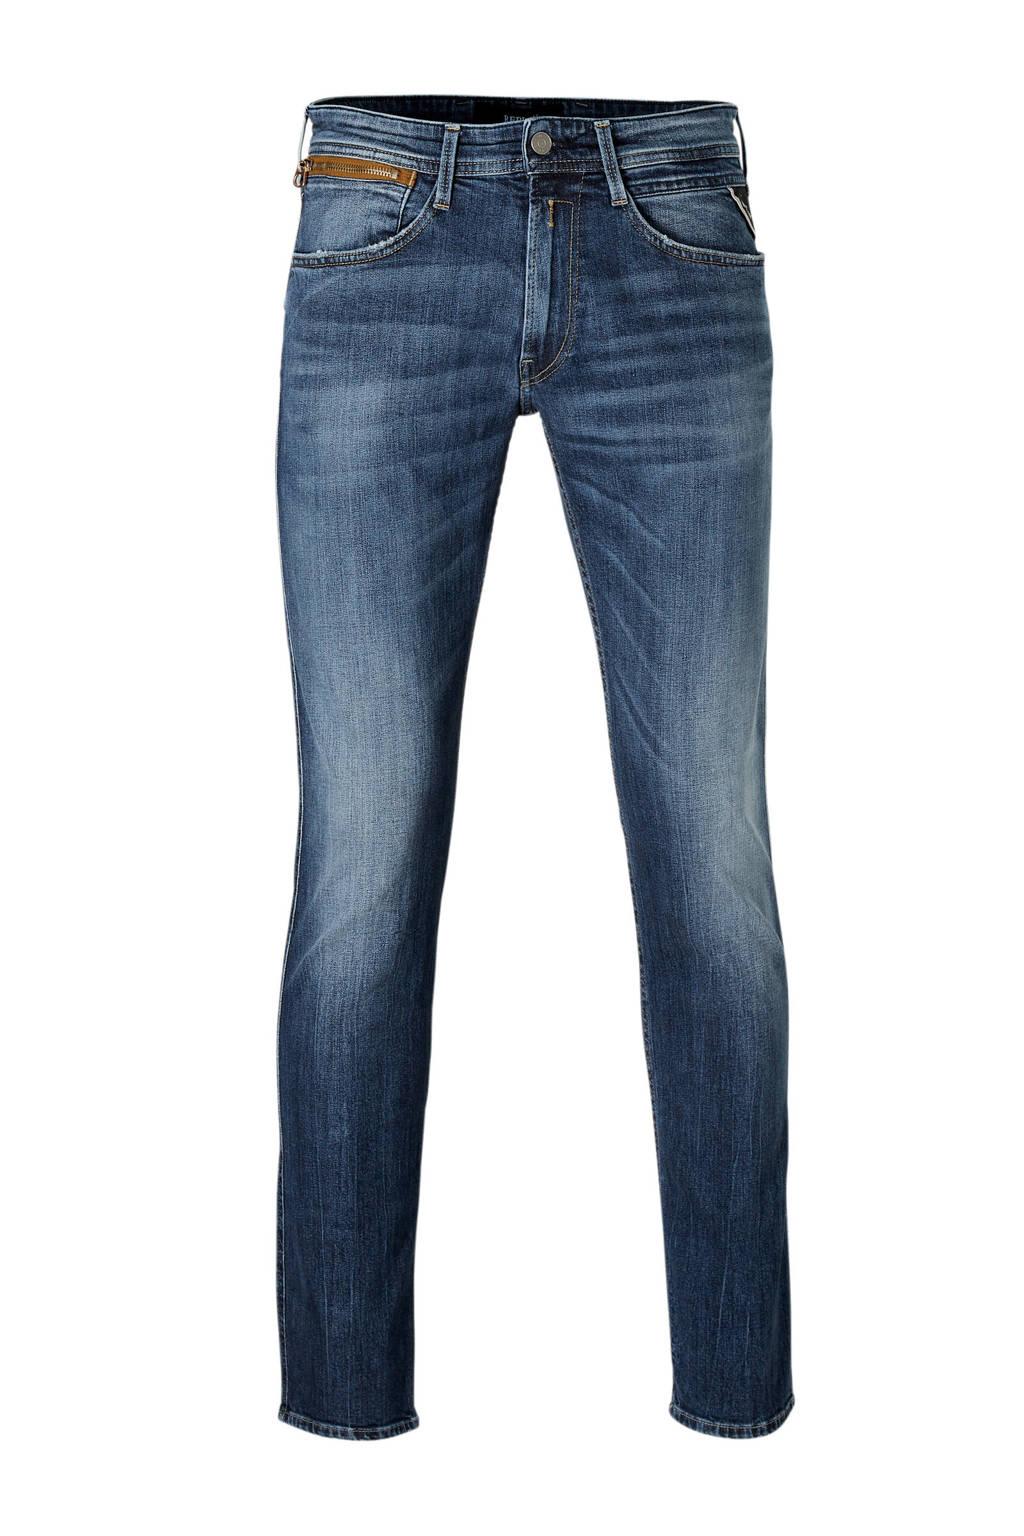 REPLAY slim fit jeans Anbass, Dark denim